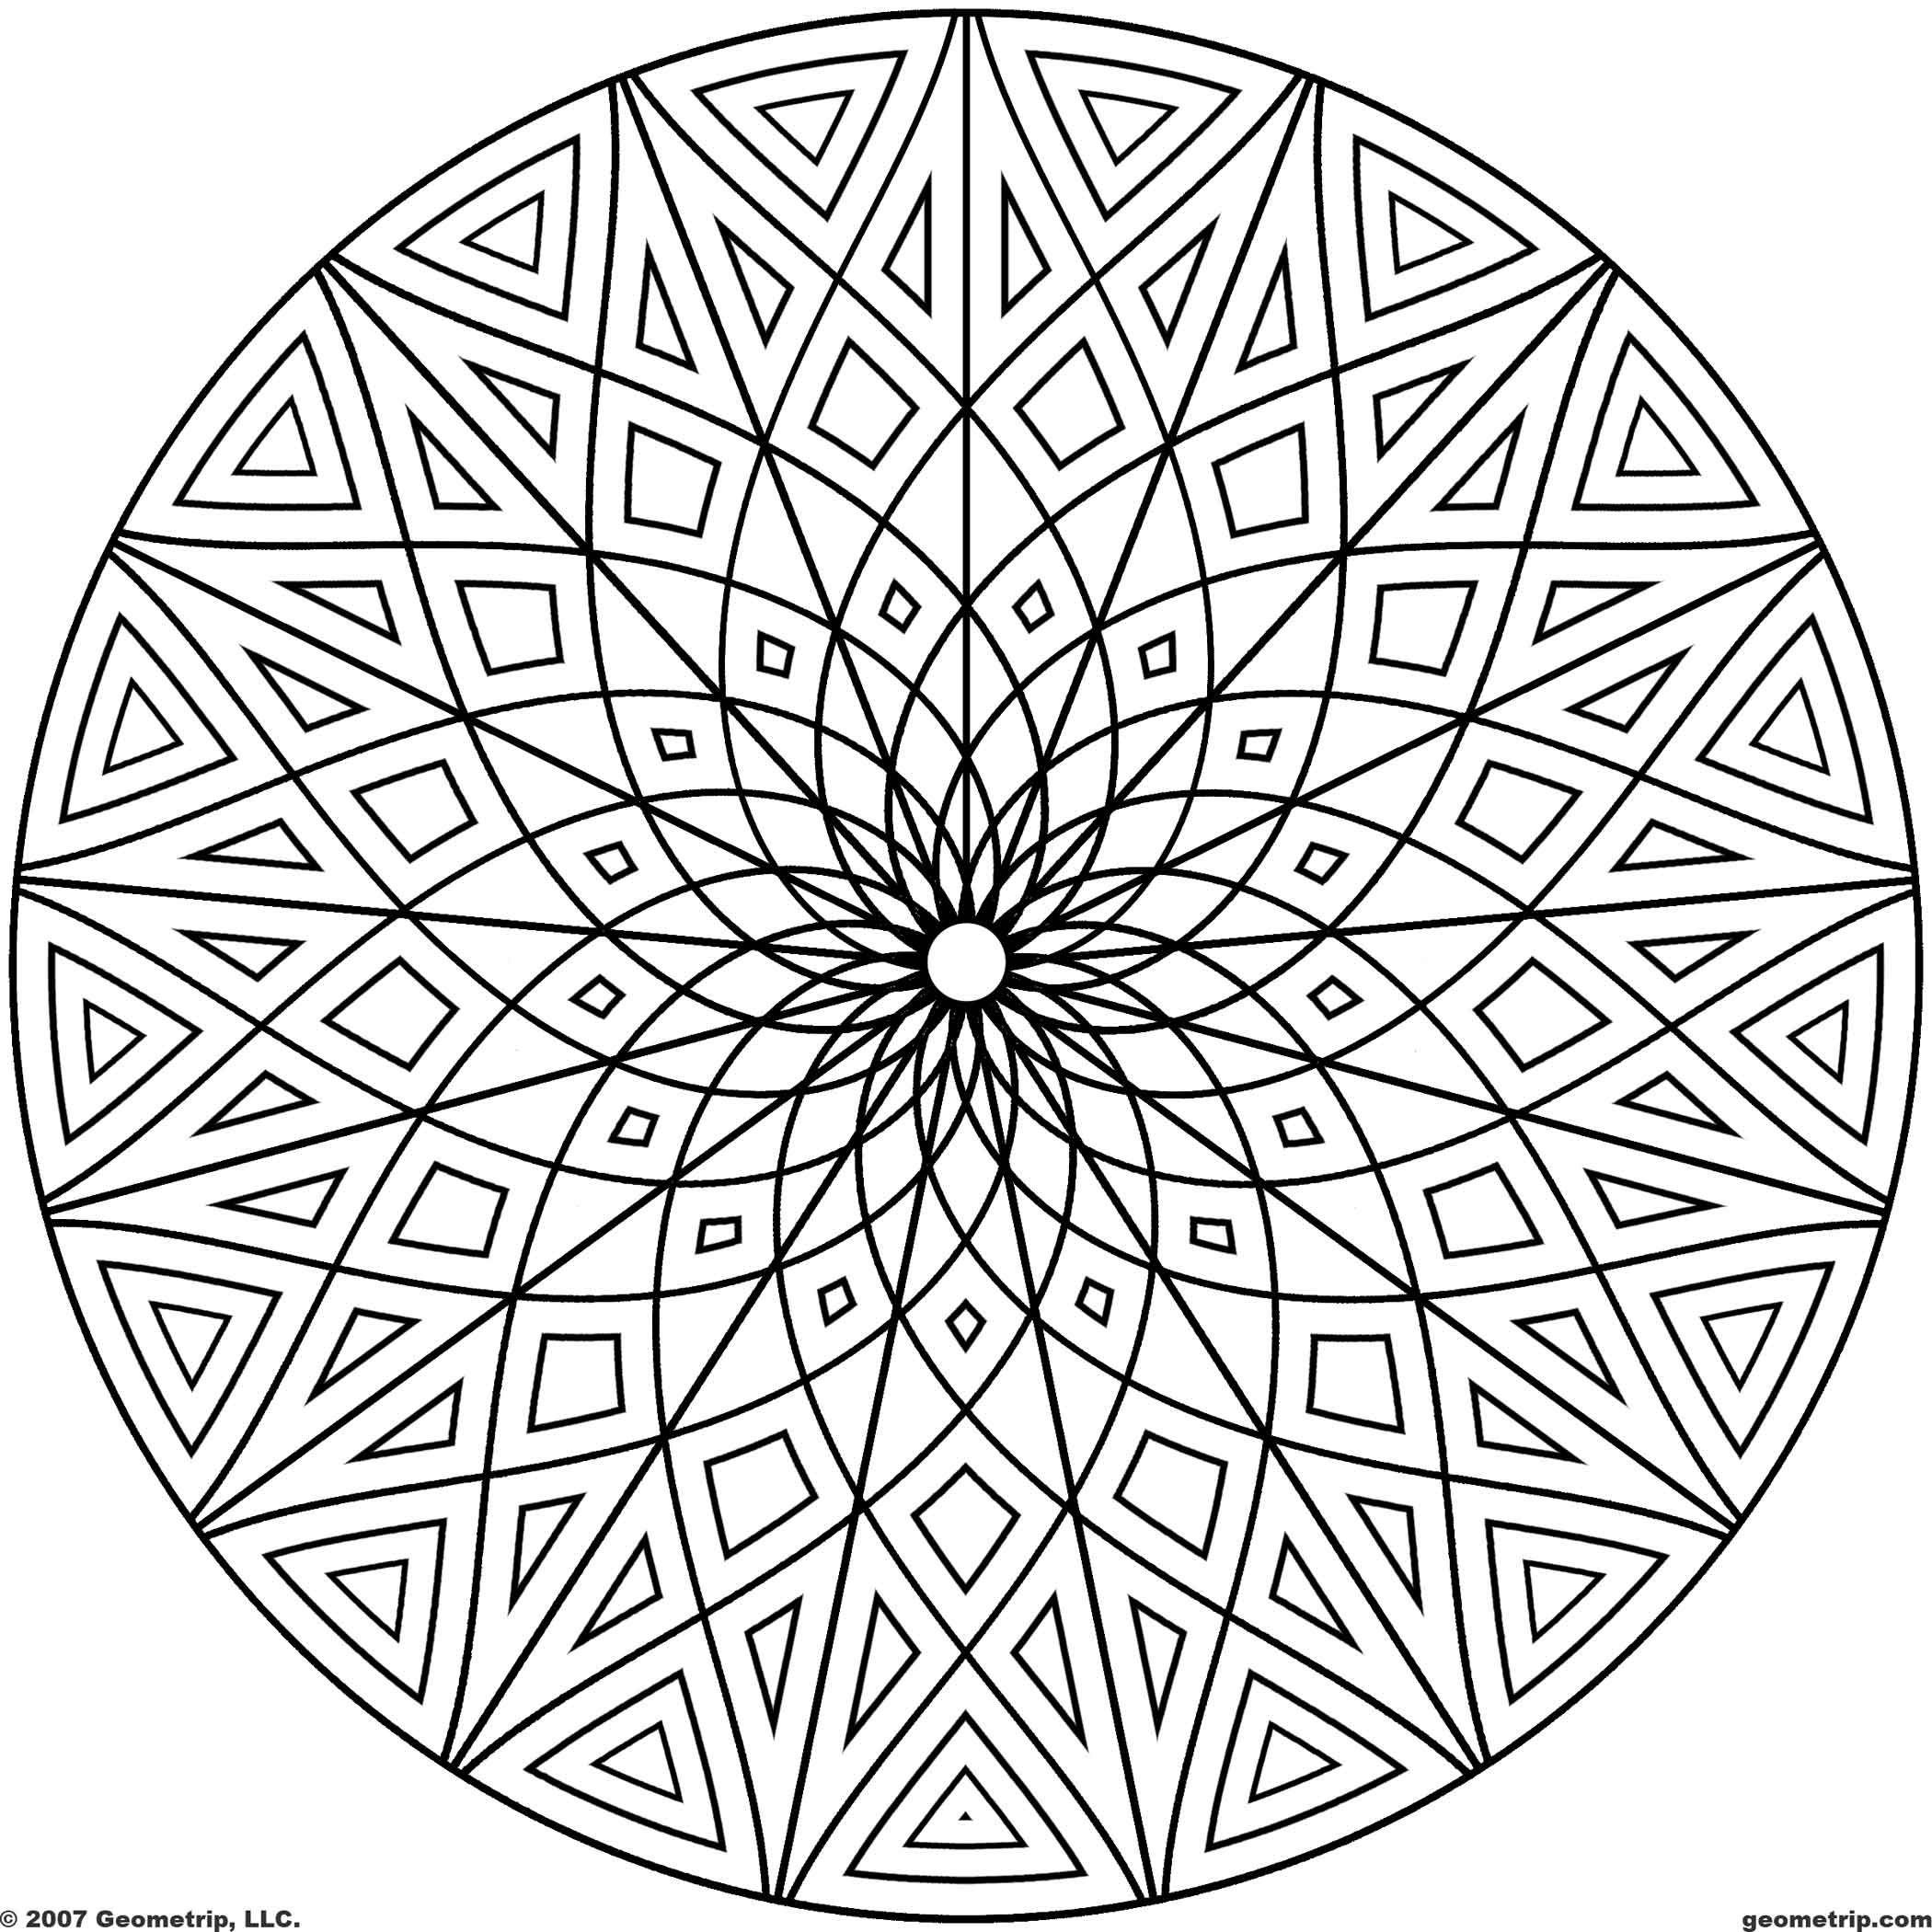 Geometrip Circles Set2 Sym17 Jpg 2 100 2 100 Pixels Geometric Coloring Pages Cool Coloring Pages Mandala Coloring Pages